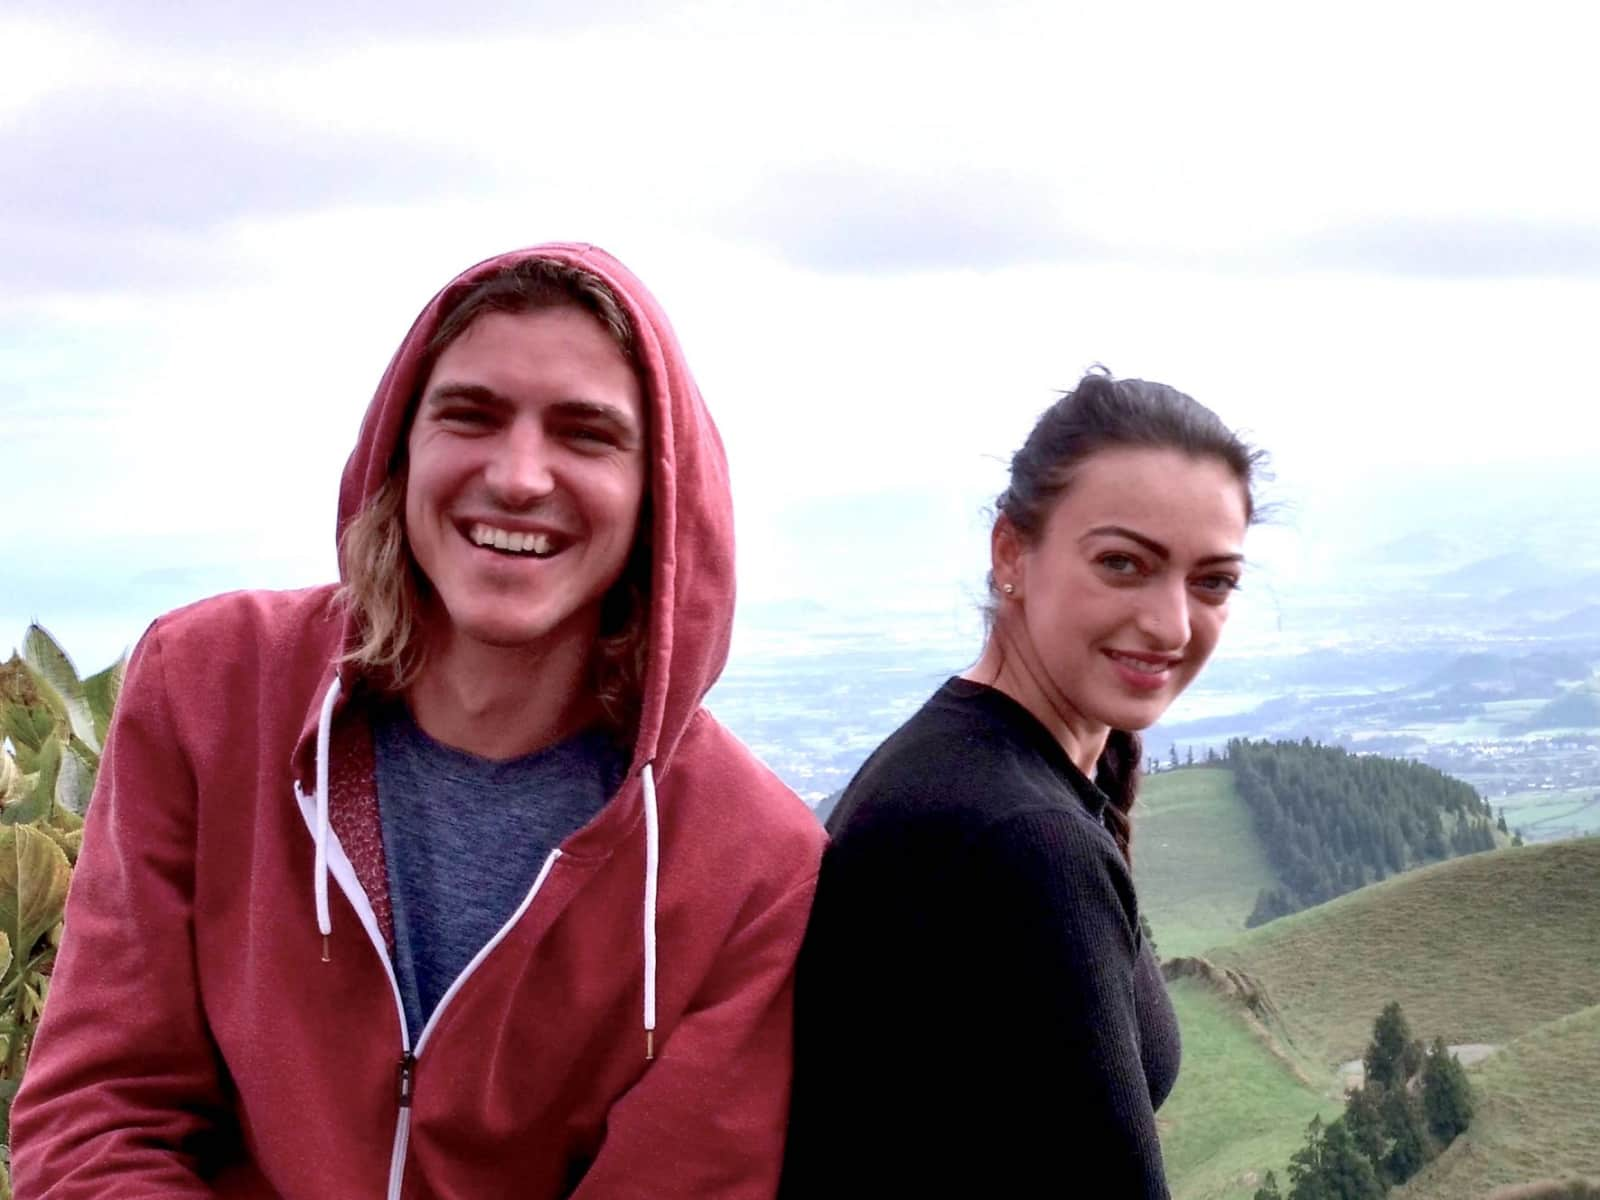 Lucie & Petr from Karviná, Czech Republic